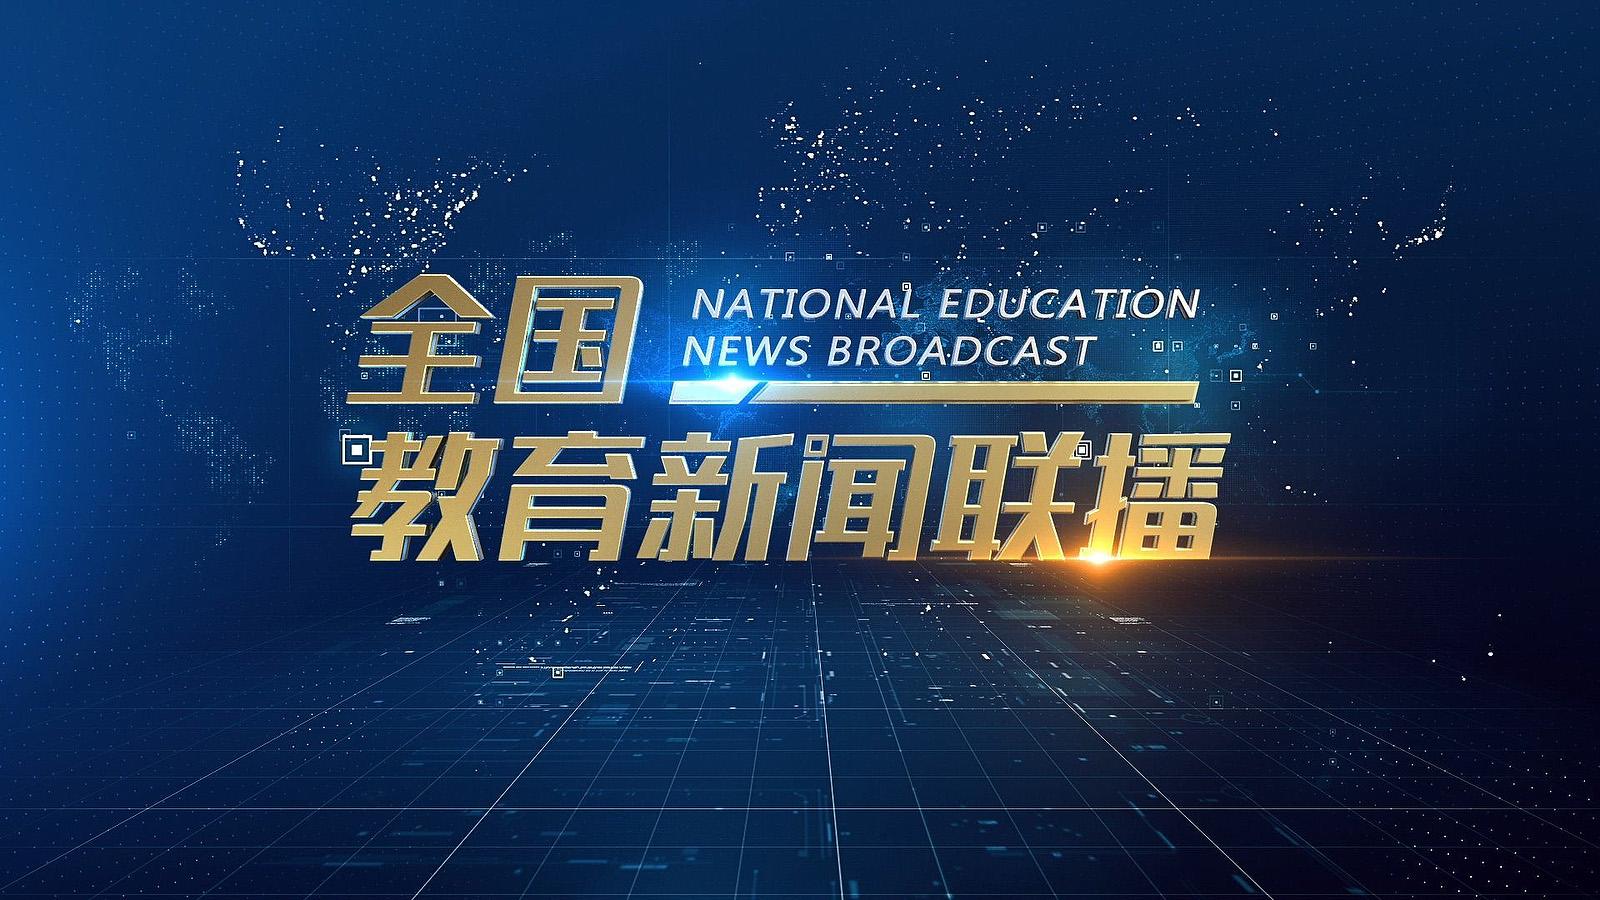 ncs_China-Education-Network-Television-Studio_0001